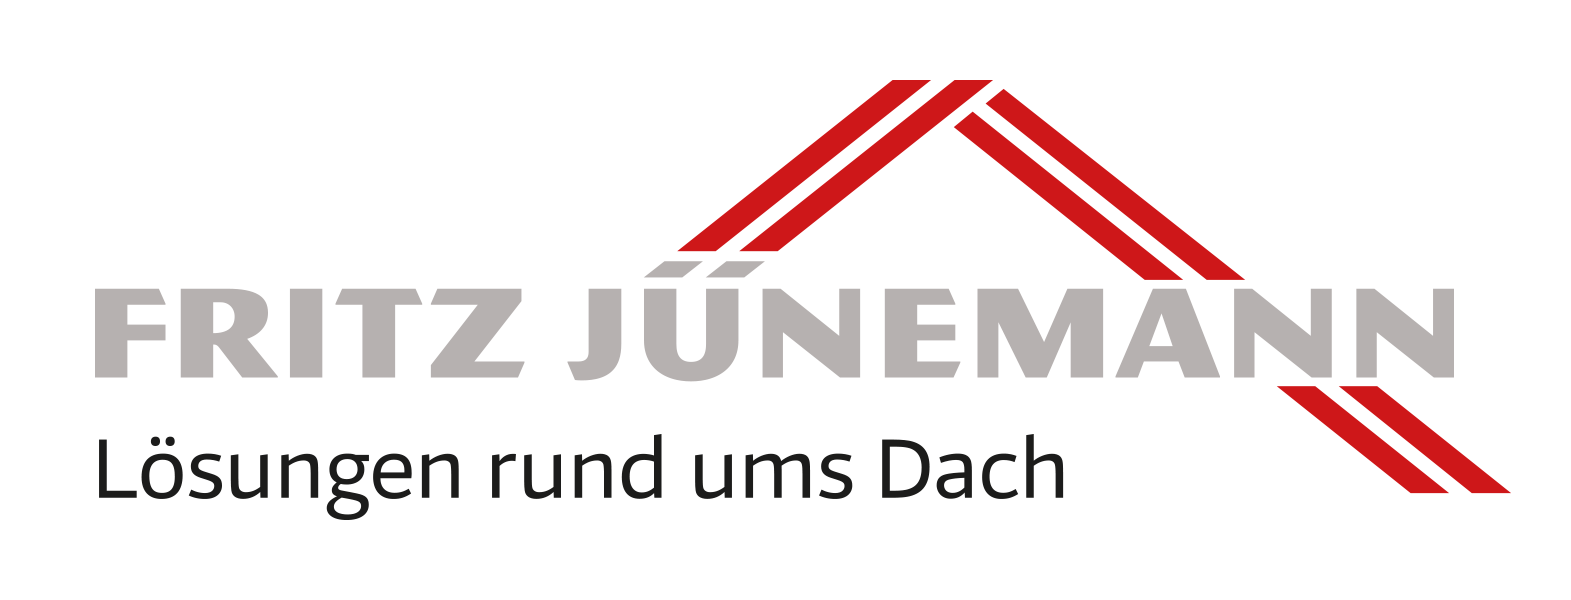 Fritz Jünemann